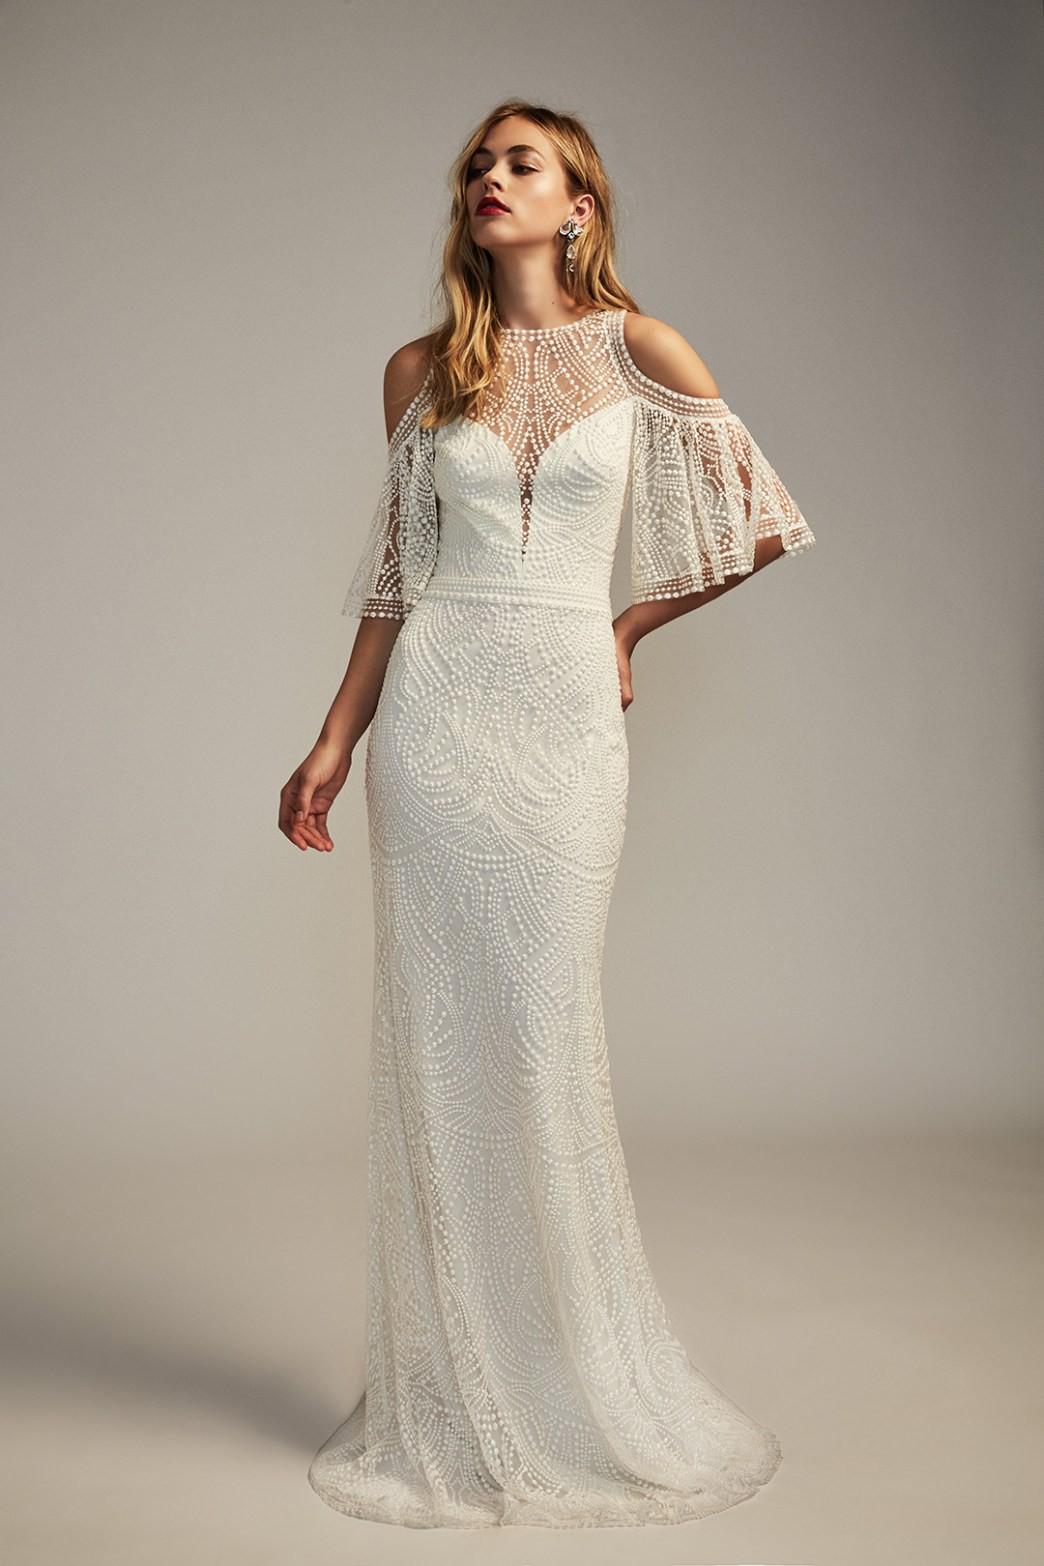 tadashi shoji luz gown sold out online wedding dress on sale - 17% off